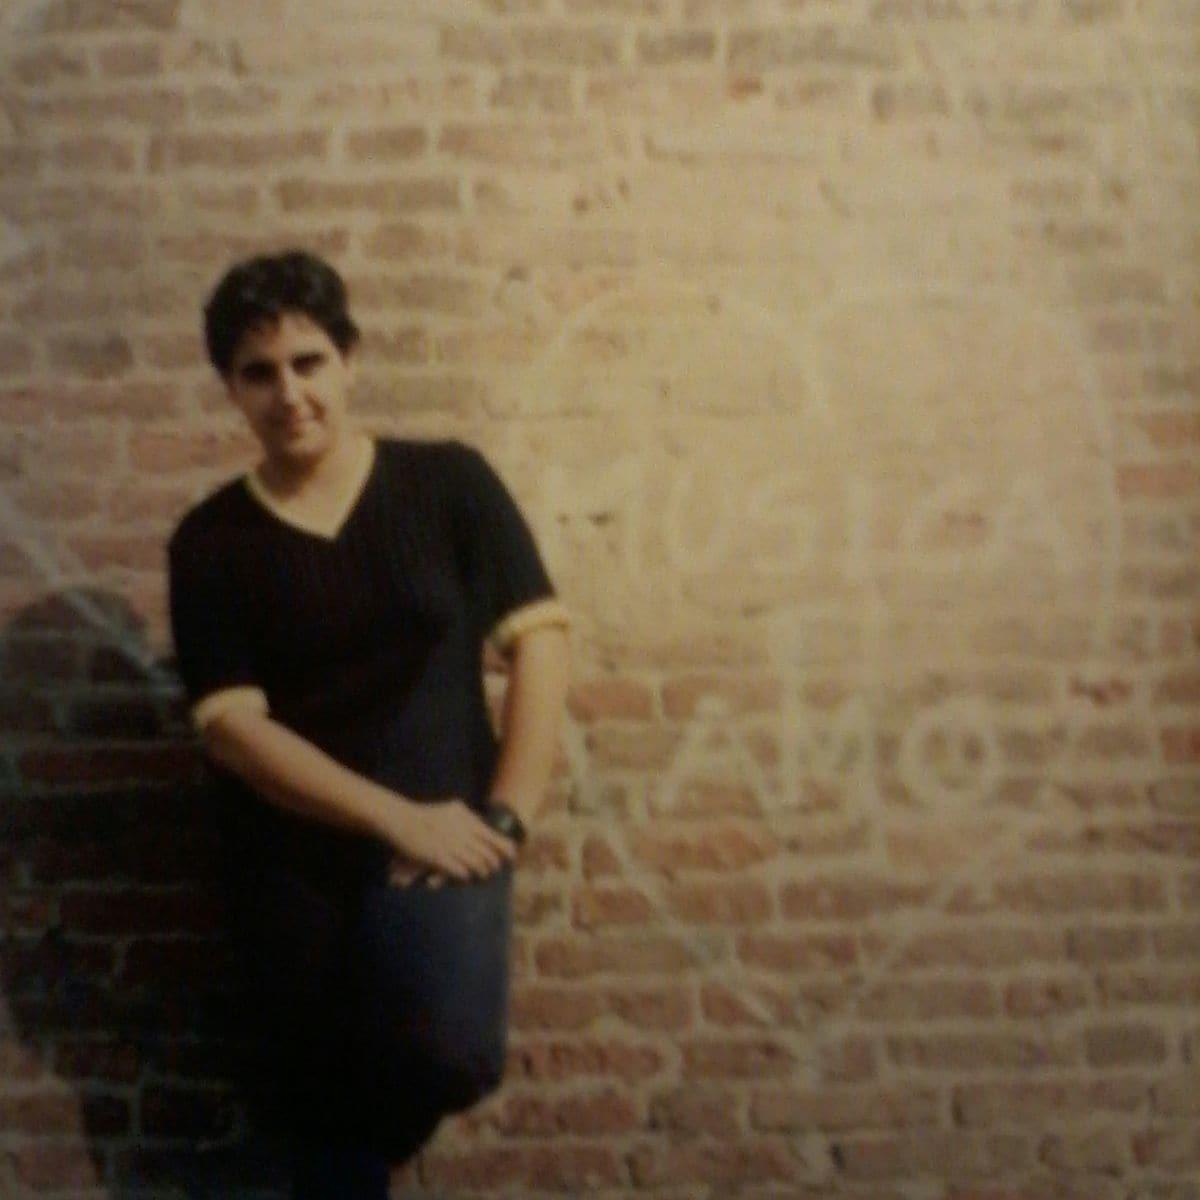 Ana Belen from Barcelona